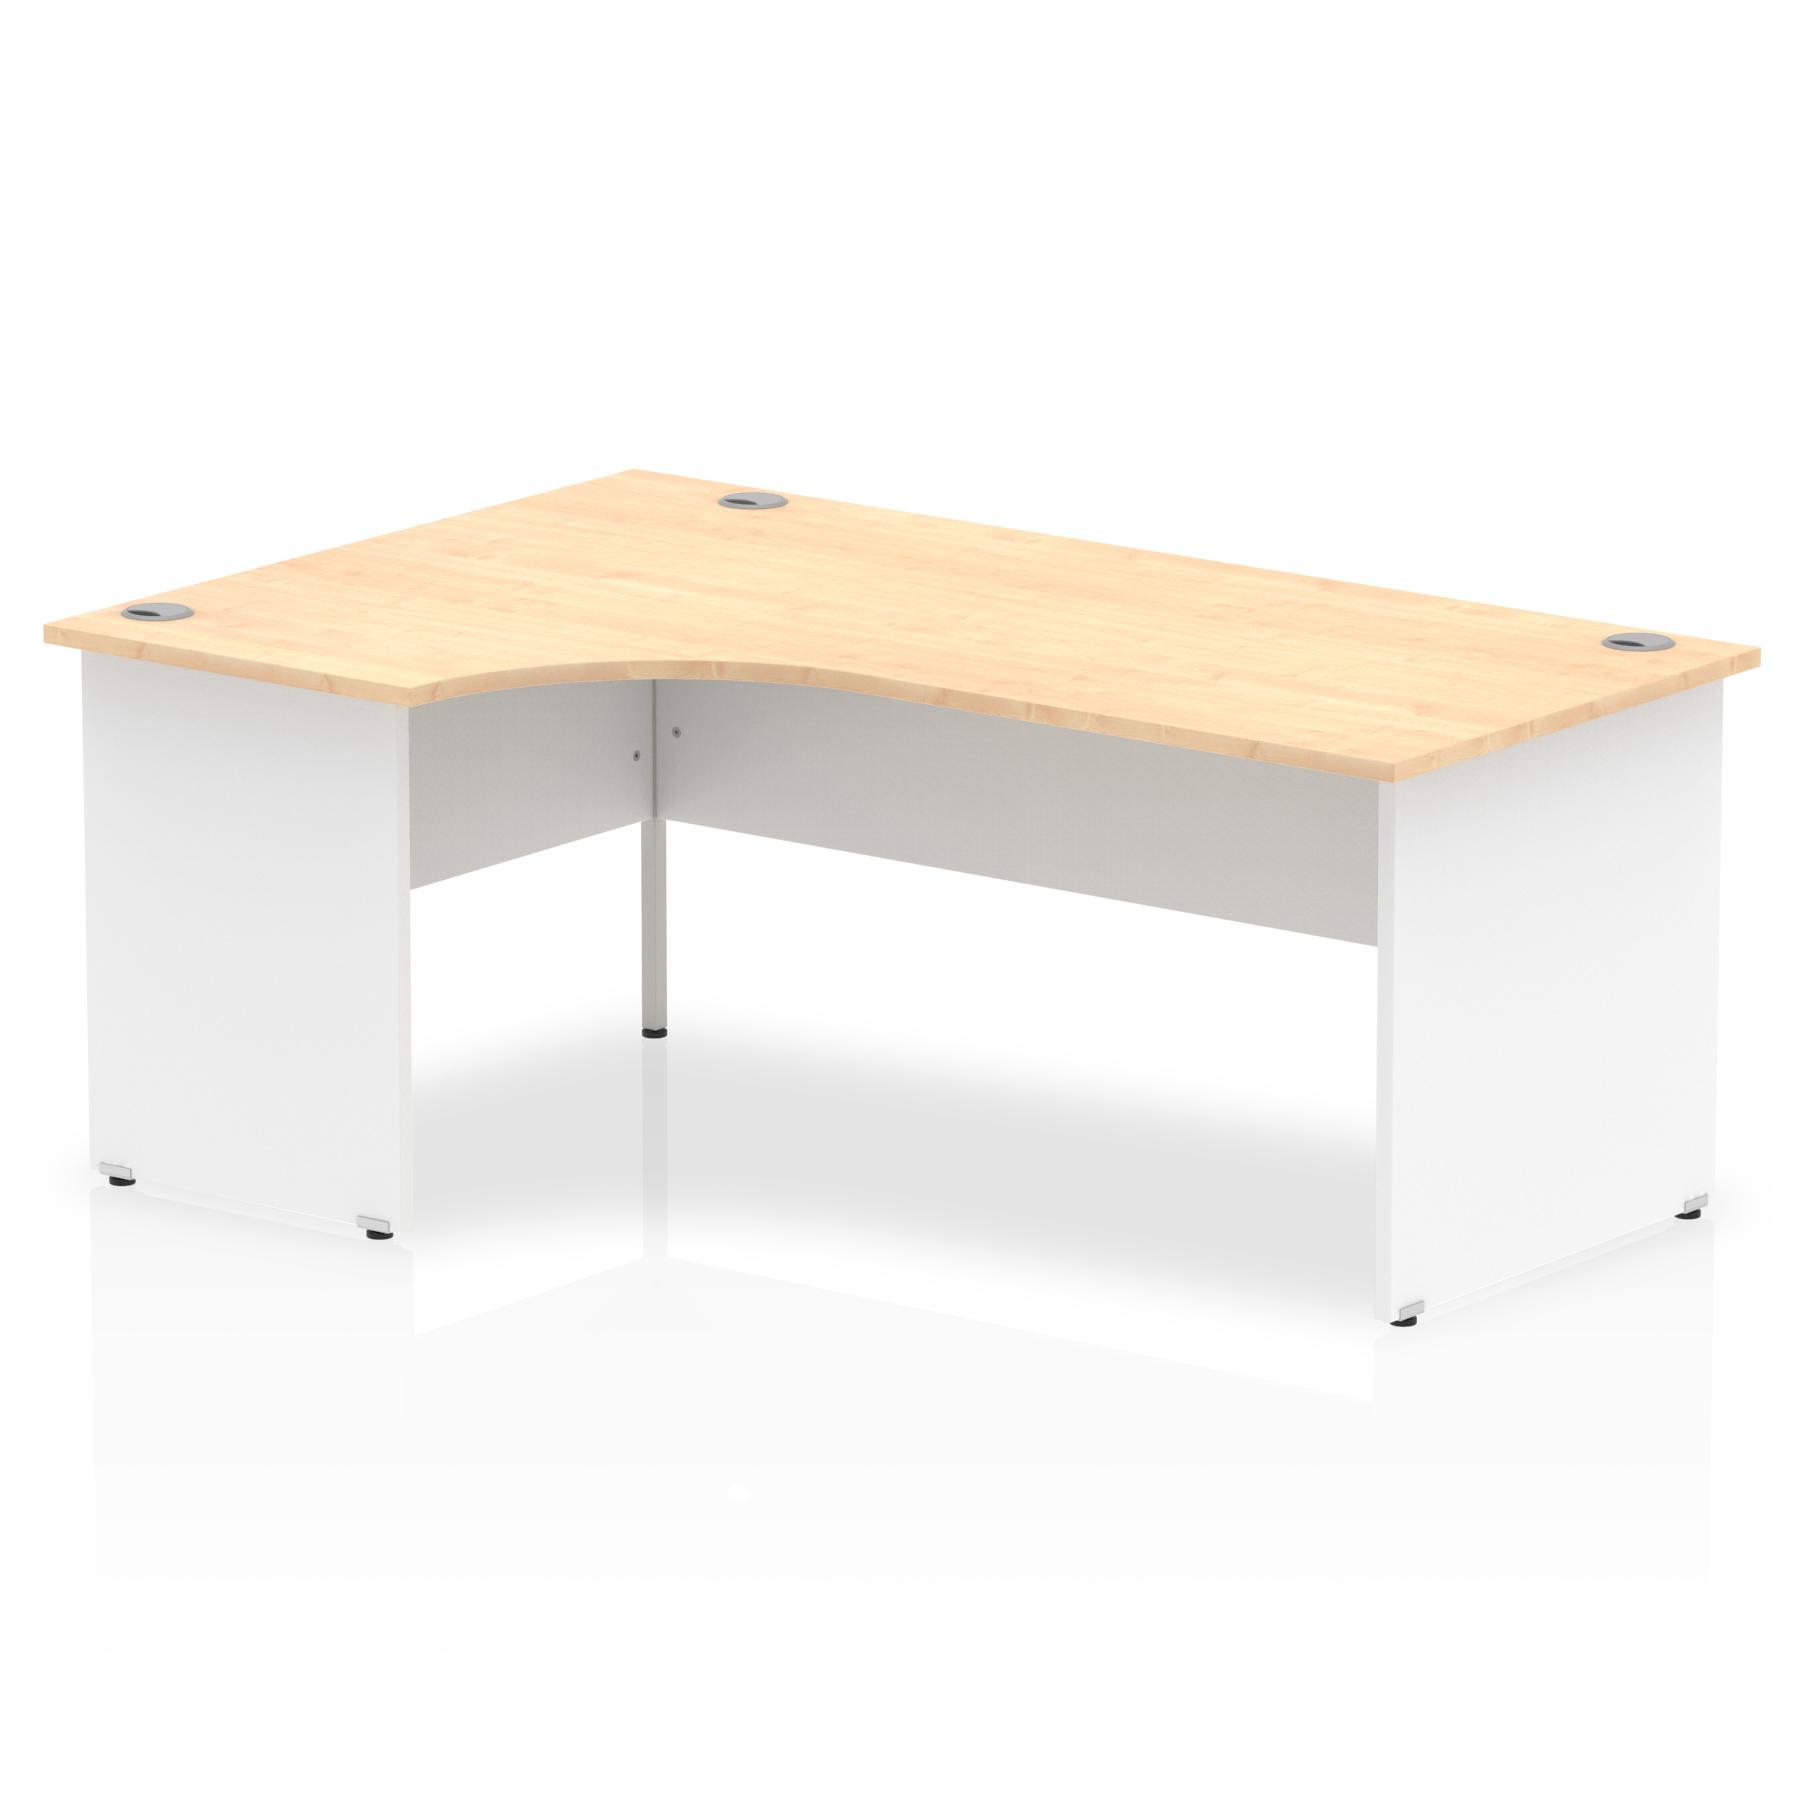 Trexus Desk Crescent Left Hand Panel End 1800x800mm Maple Top White Panels Ref TT000114